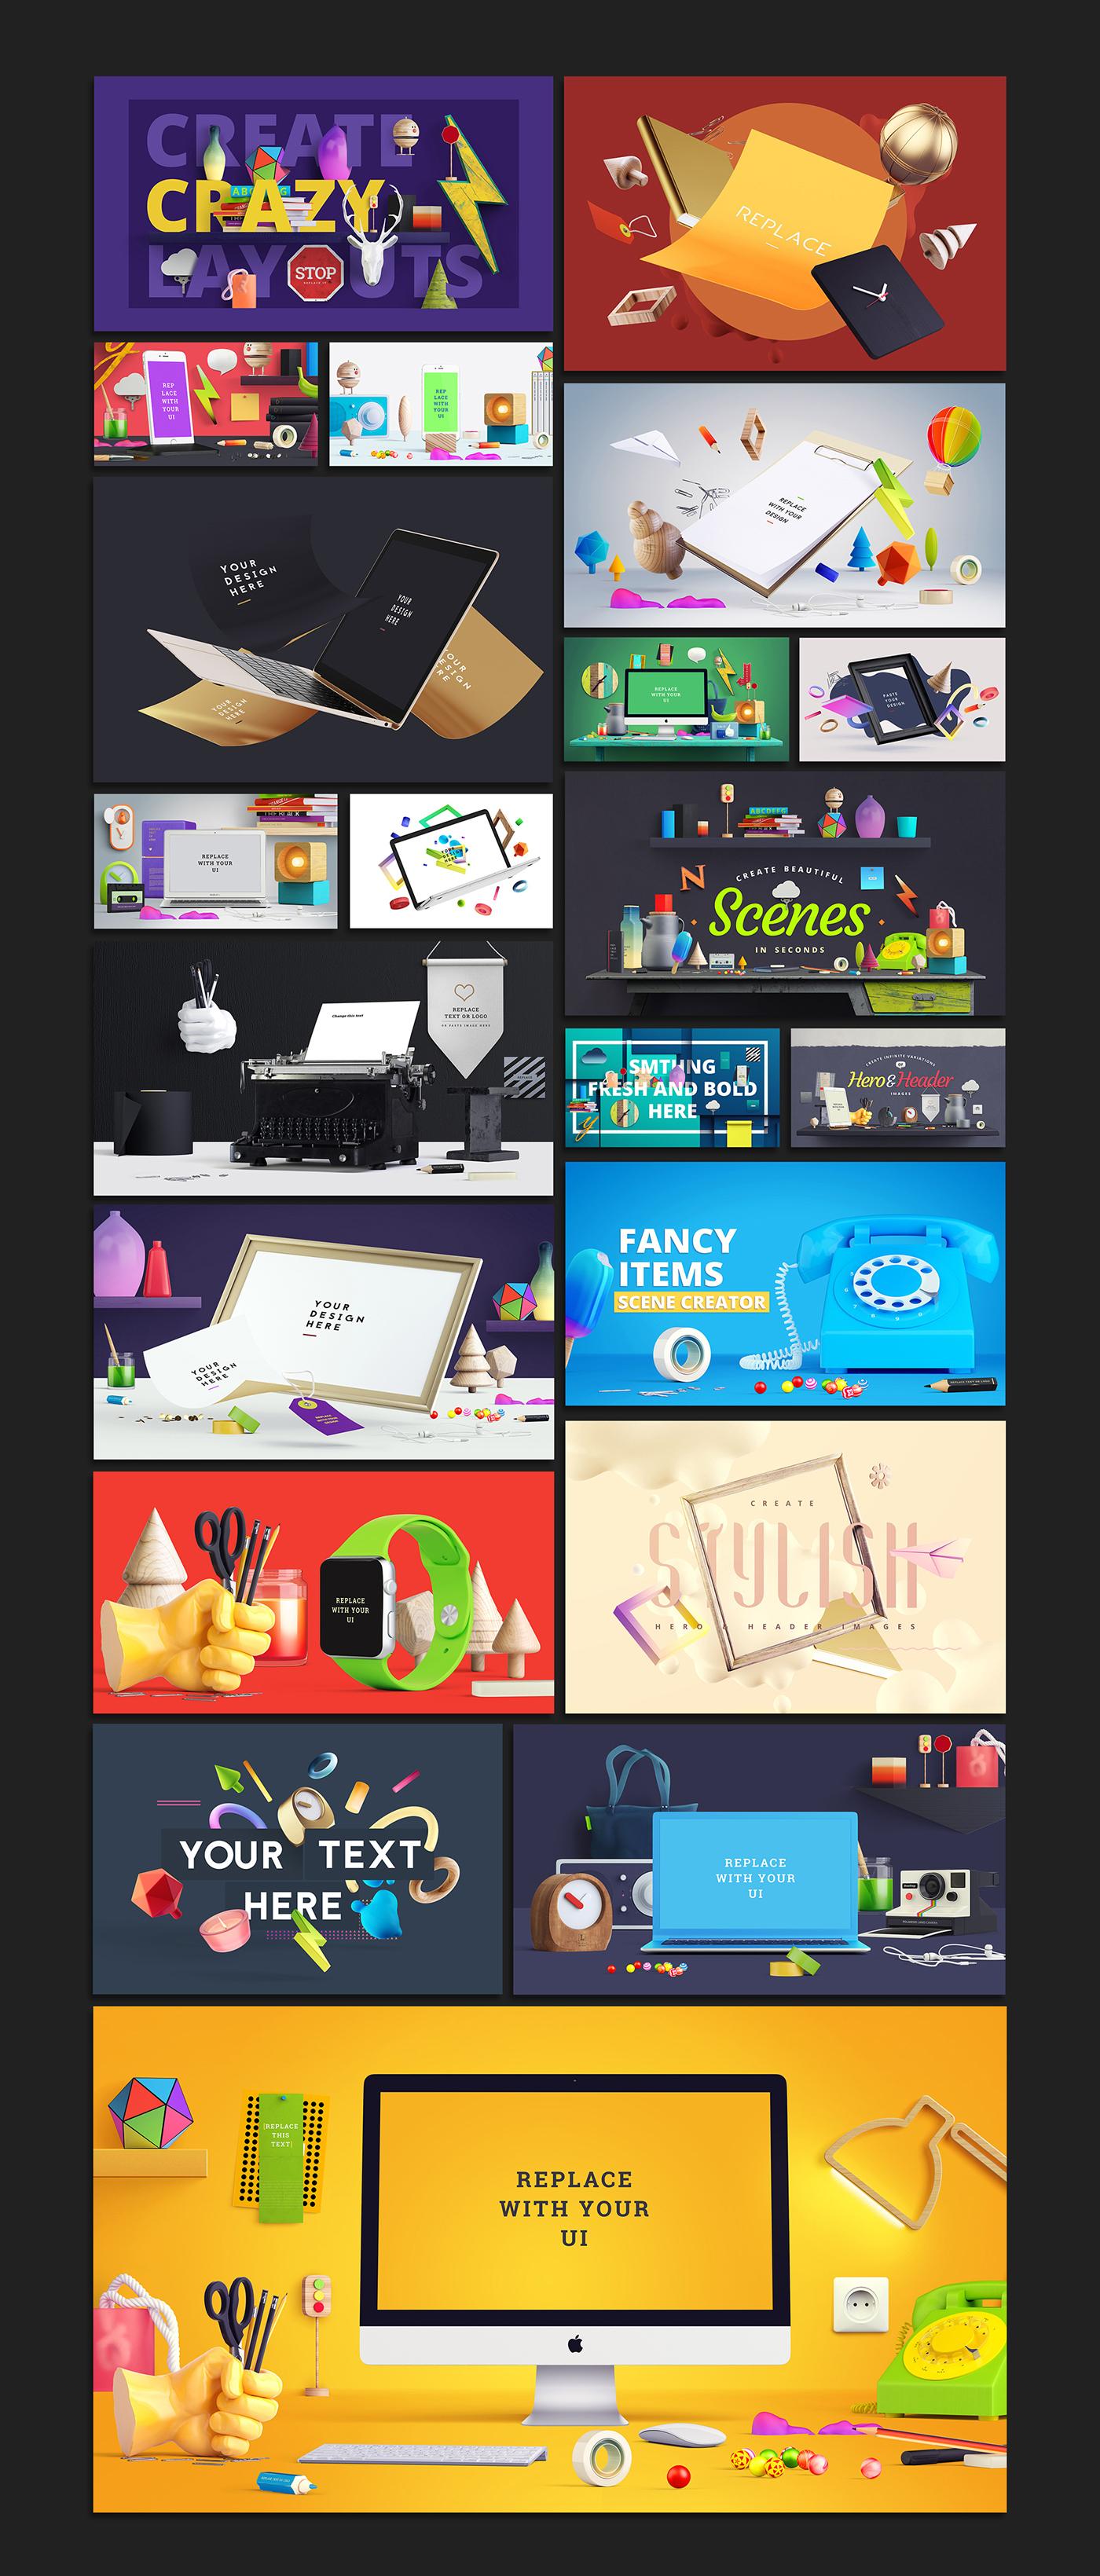 scene Generator scene generator Mockup free mock-up table product psd free psd freebie